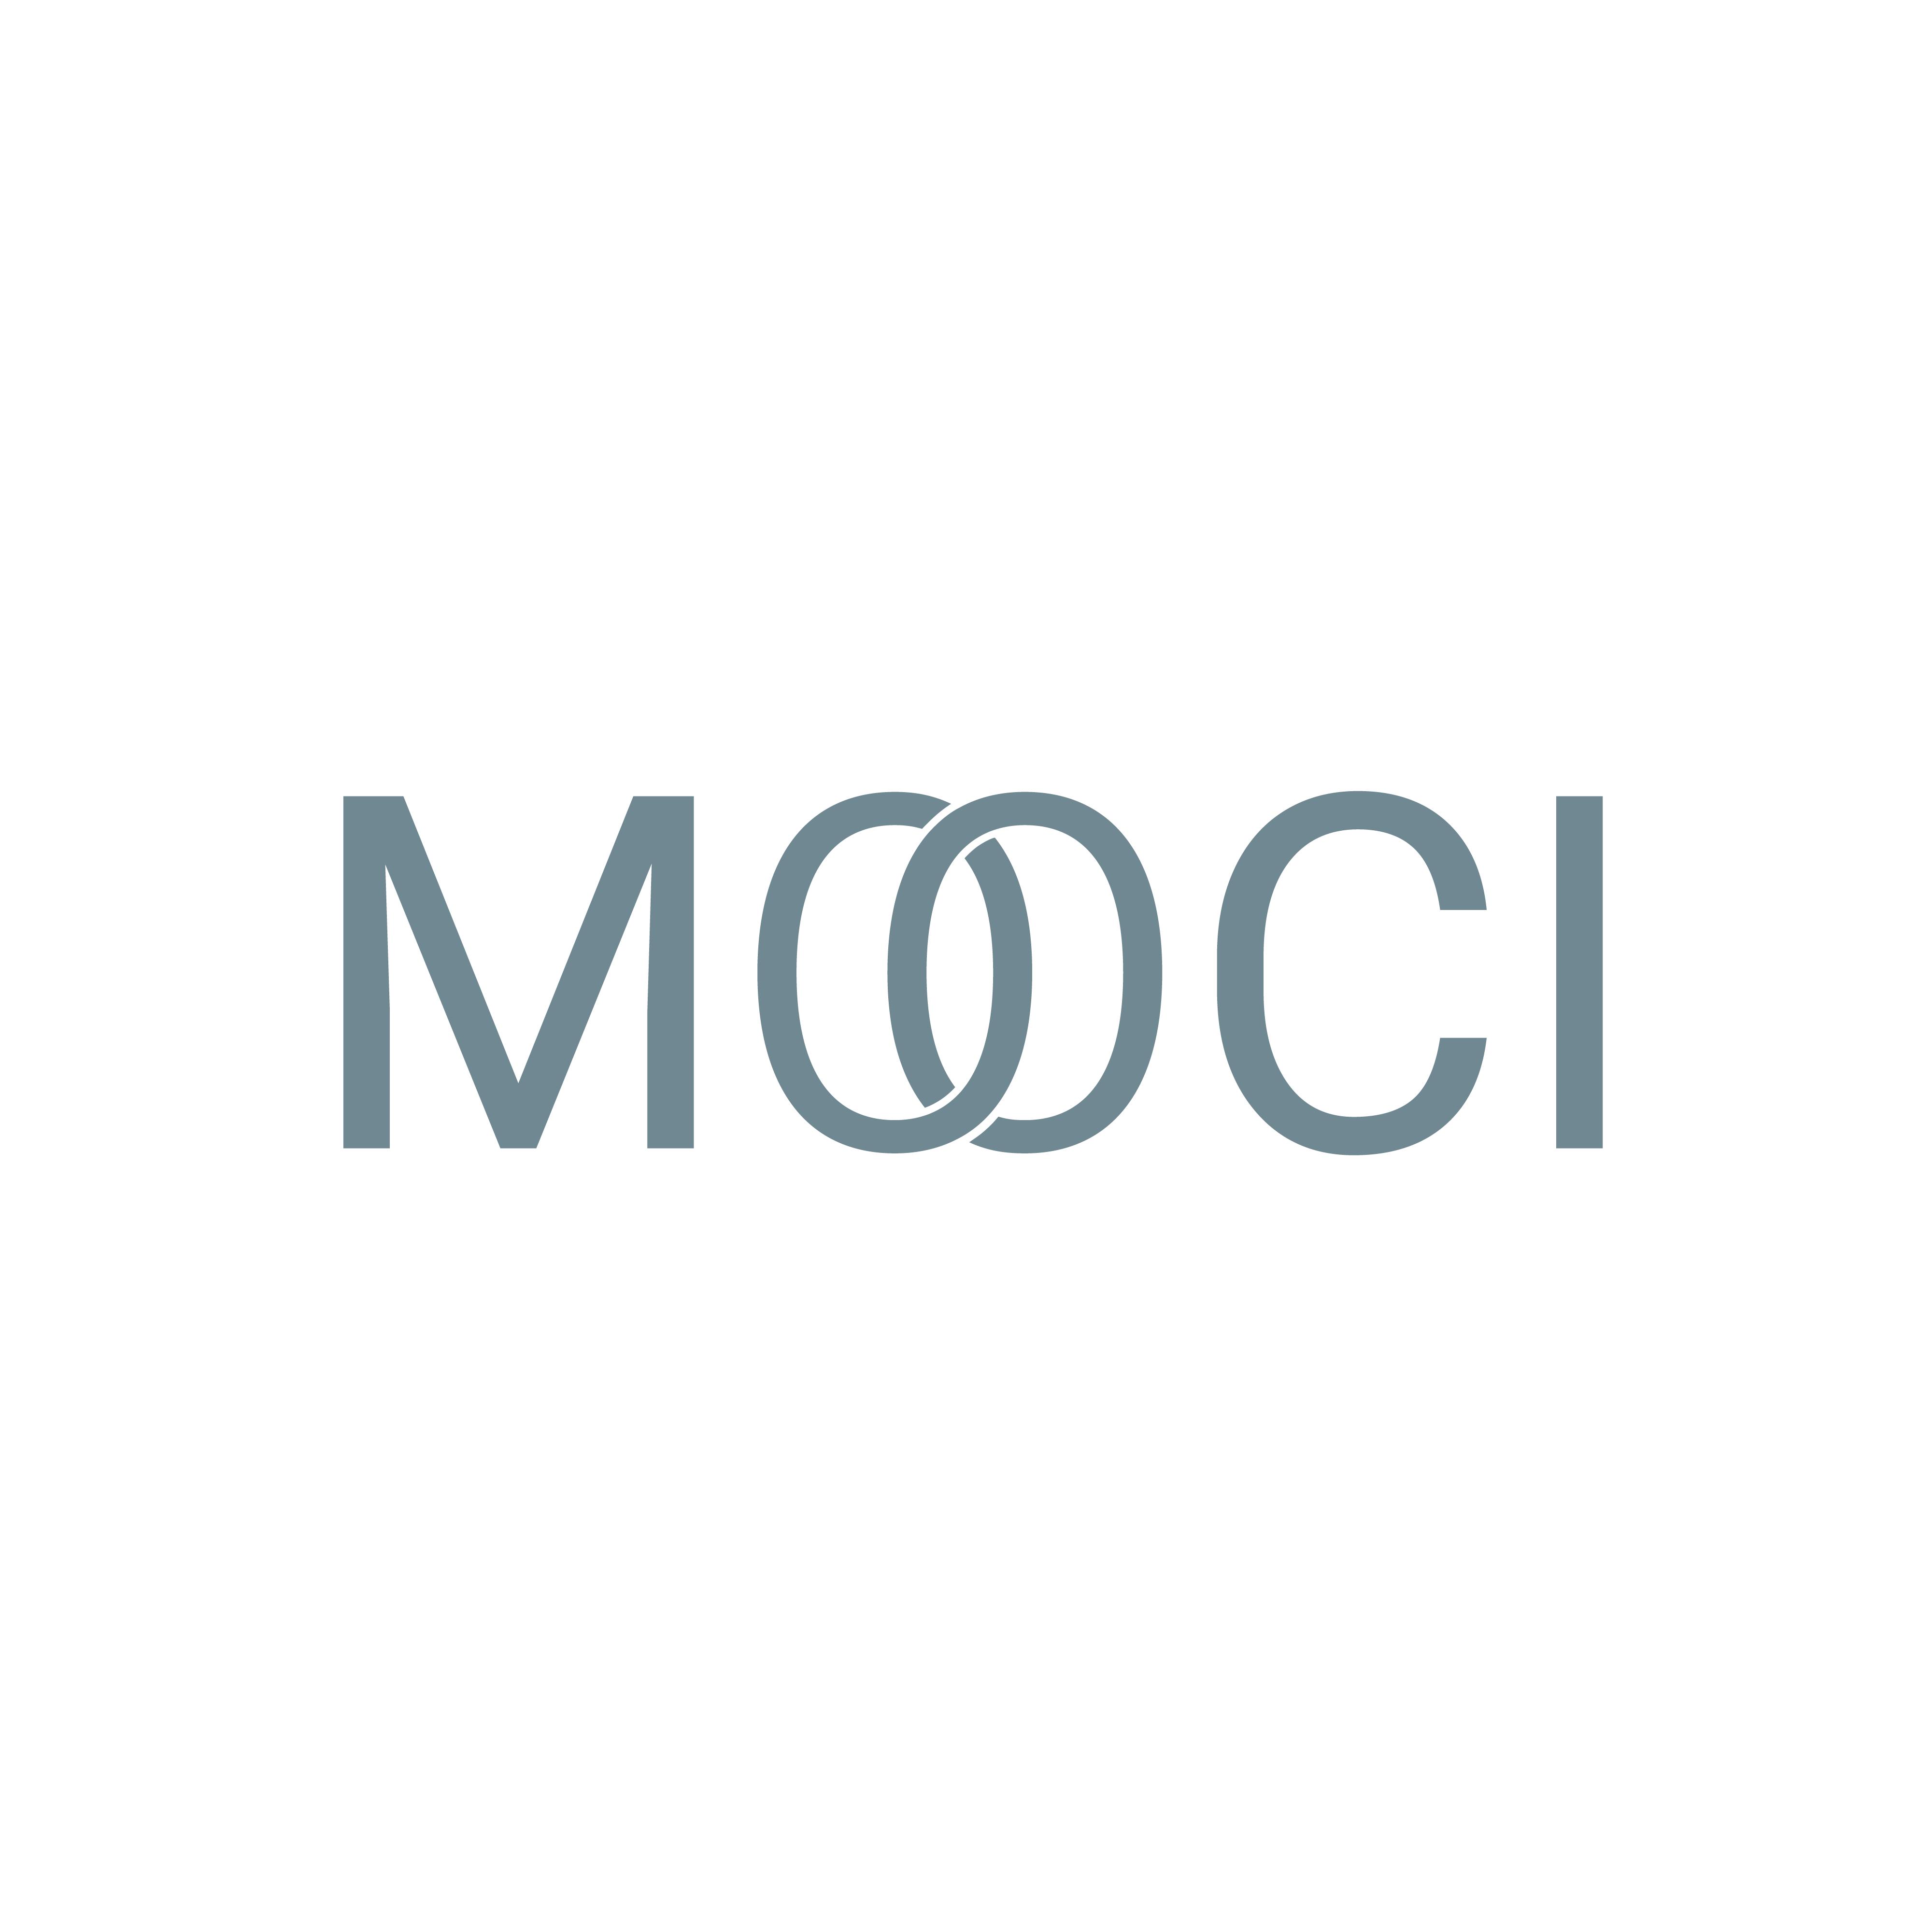 MOOCI GmbH